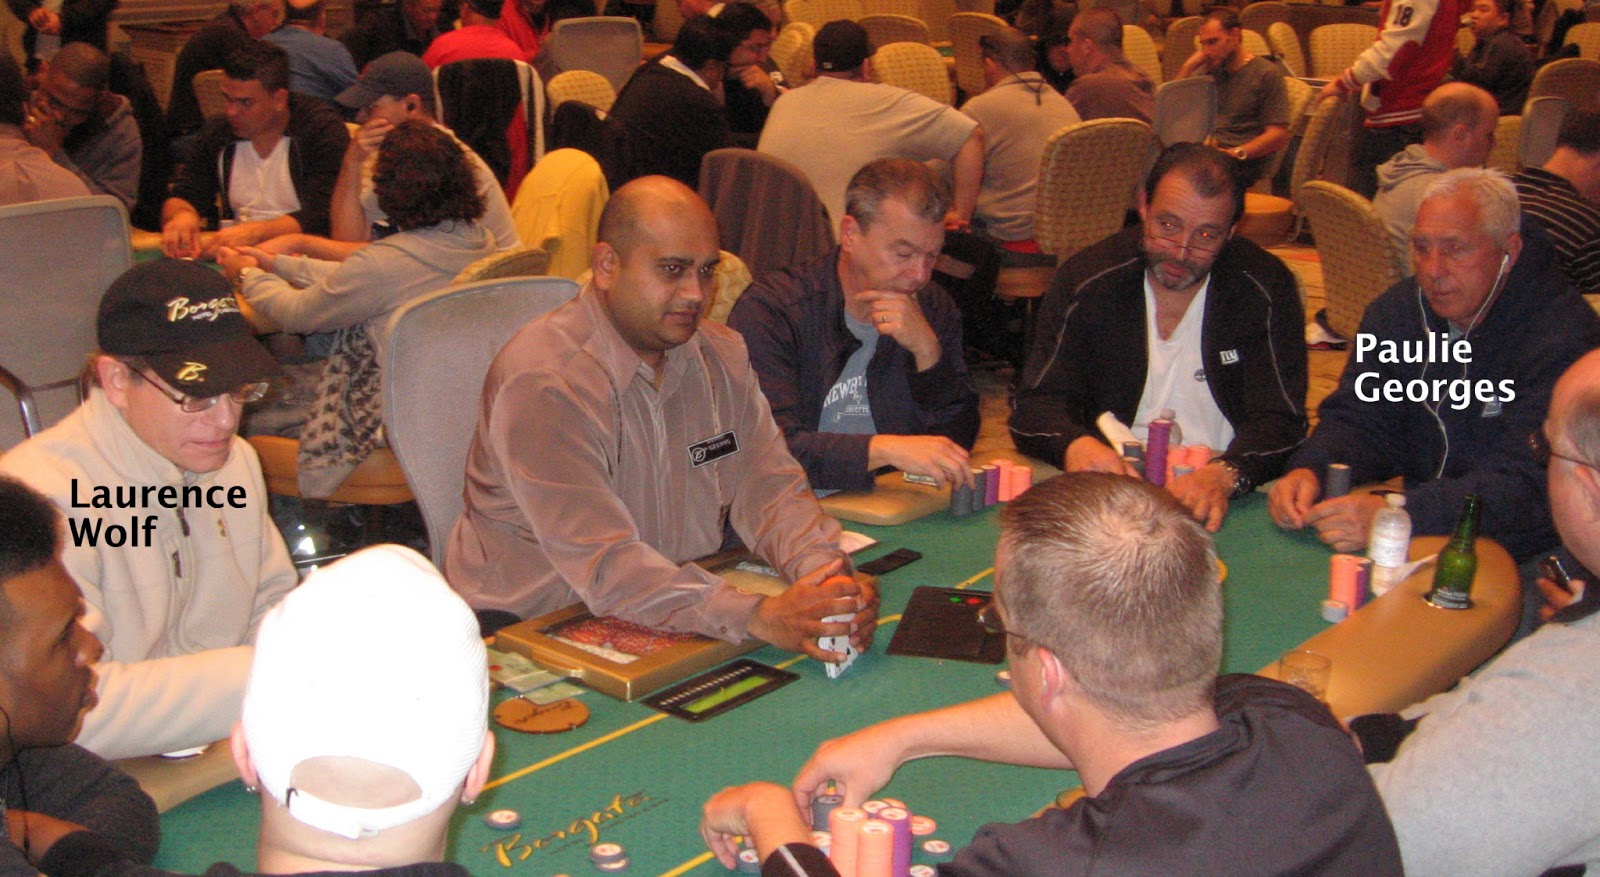 Borgata Spring Poker Open 2013 04 19 13